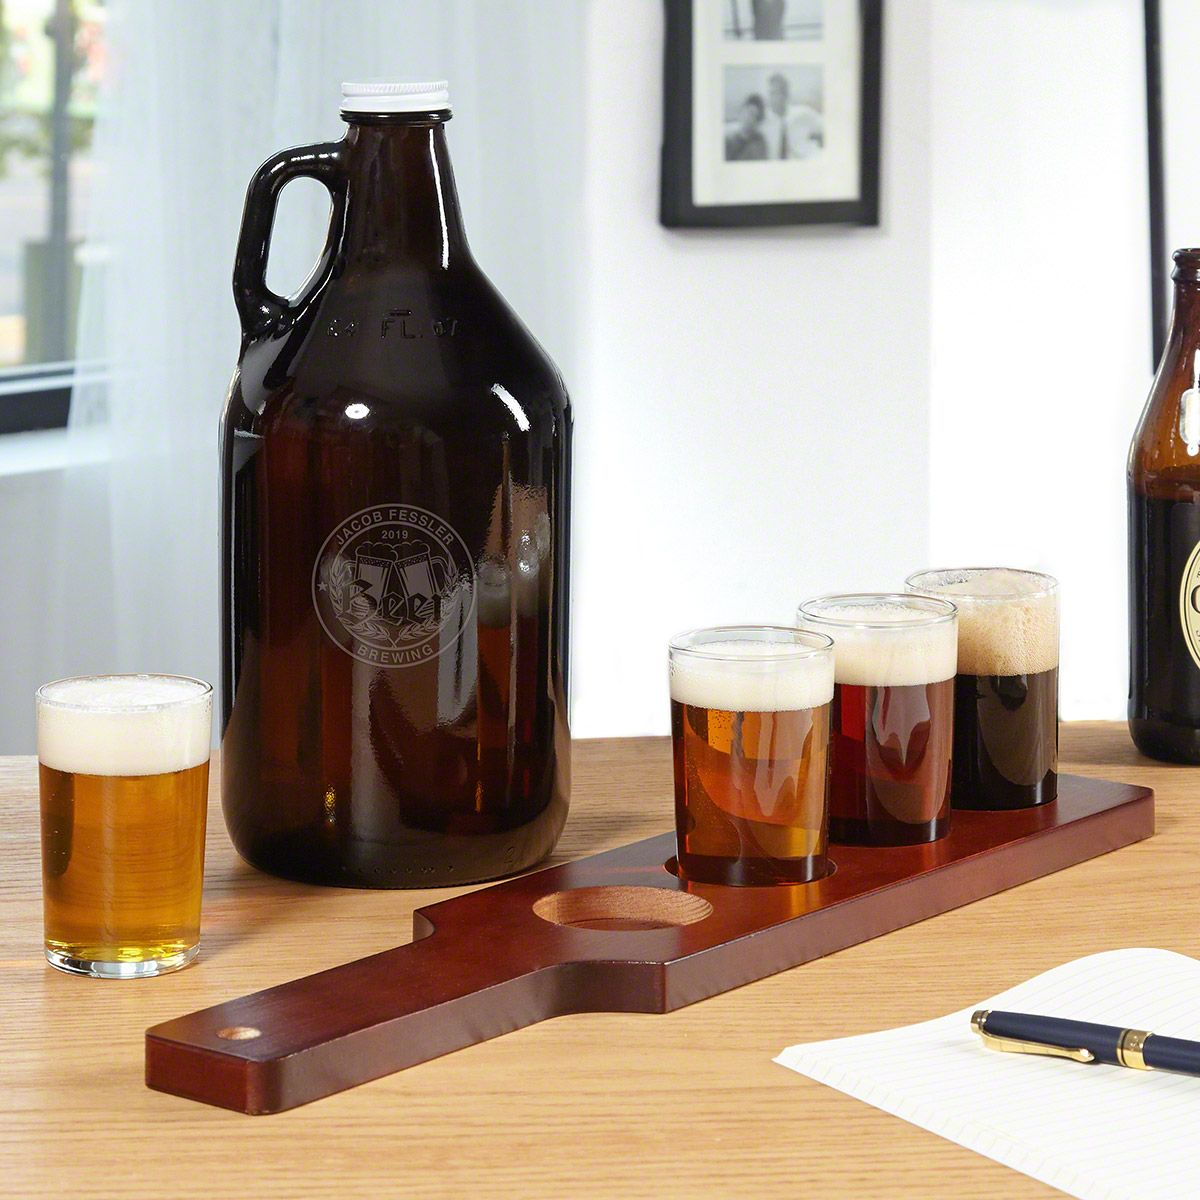 Bierhaus Personalized Beer Flight and Growler Set